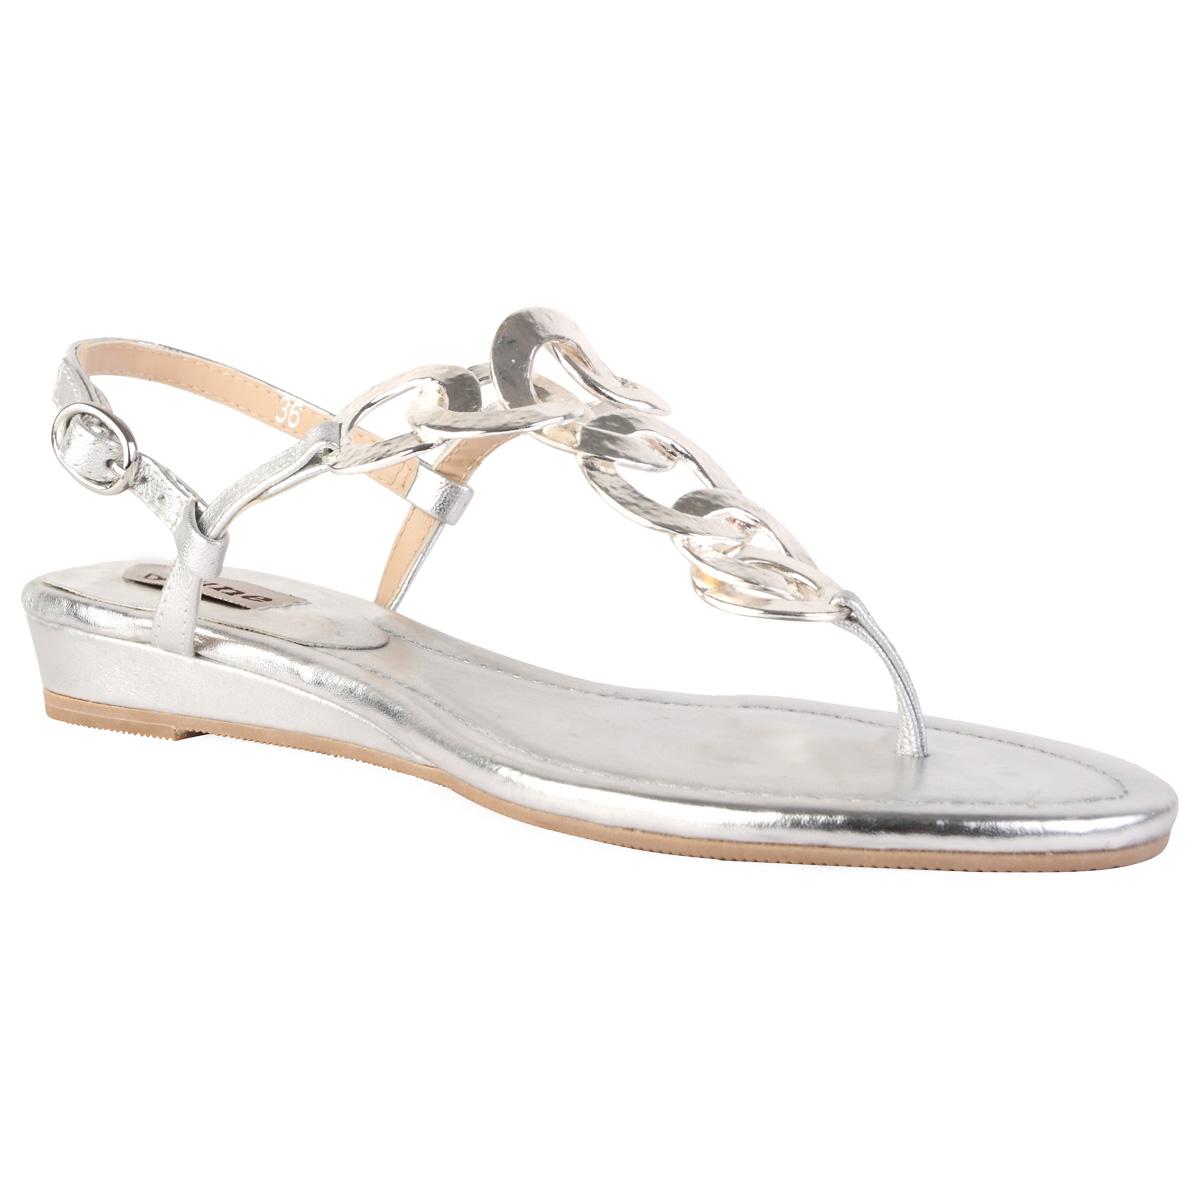 Zapatos Zapatos Sharemedoc Zapatos Sharemedoc Sandalias Plateadas Sandalias Sandalias Plateadas Sharemedoc Plateadas W2YEHeD9Ib